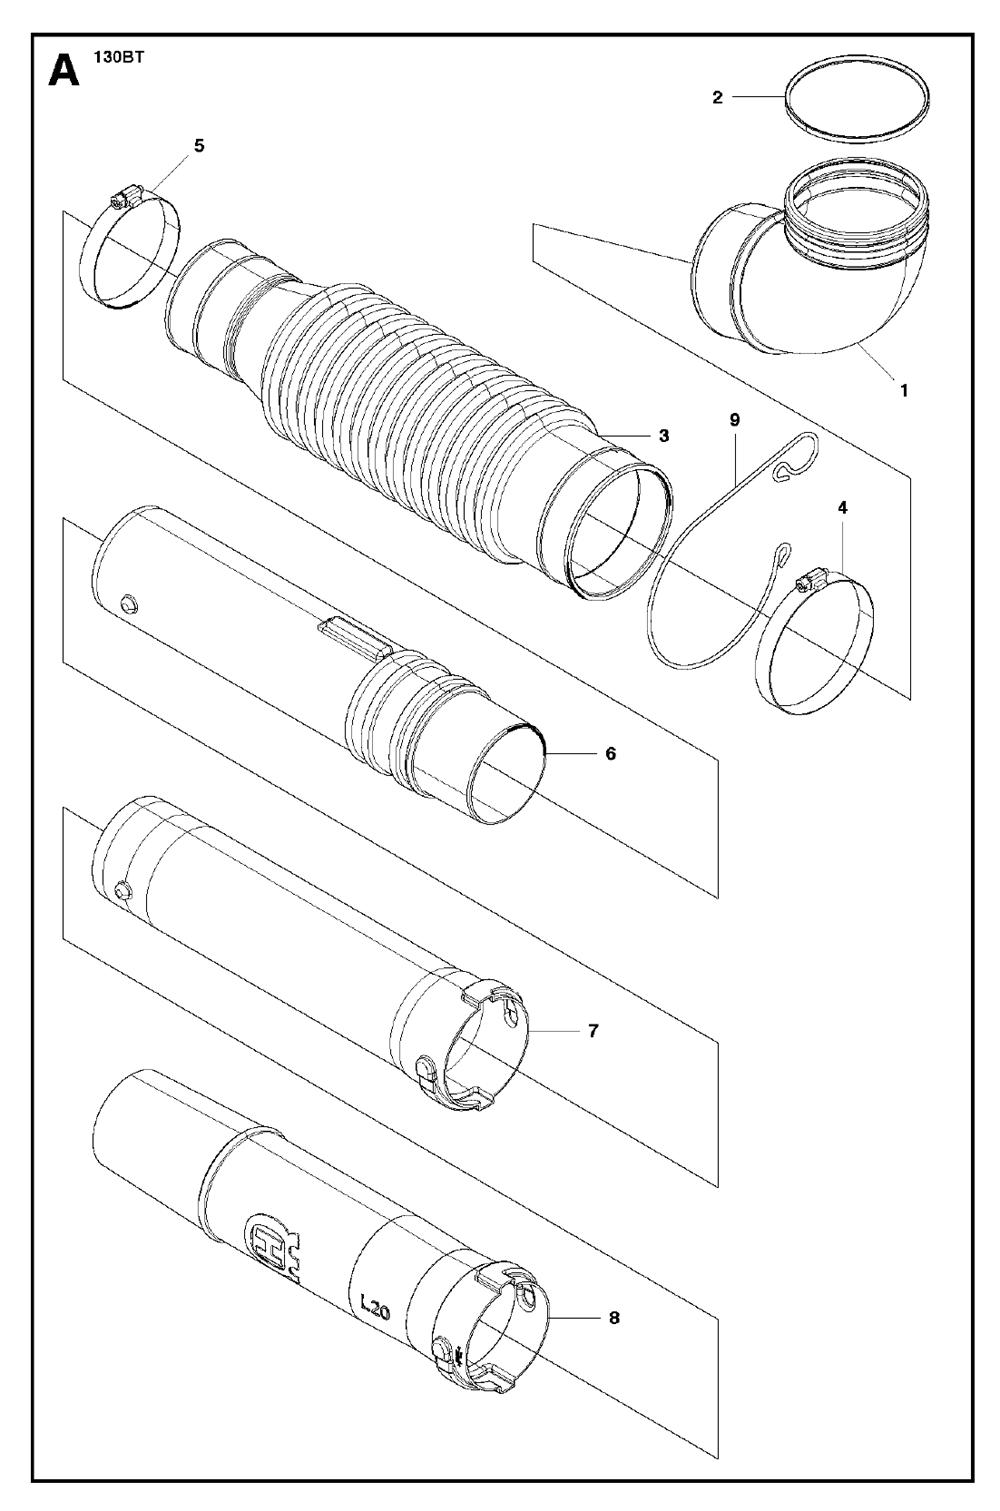 Buy Husqvarna 130BT Type-1 Replacement Tool Parts